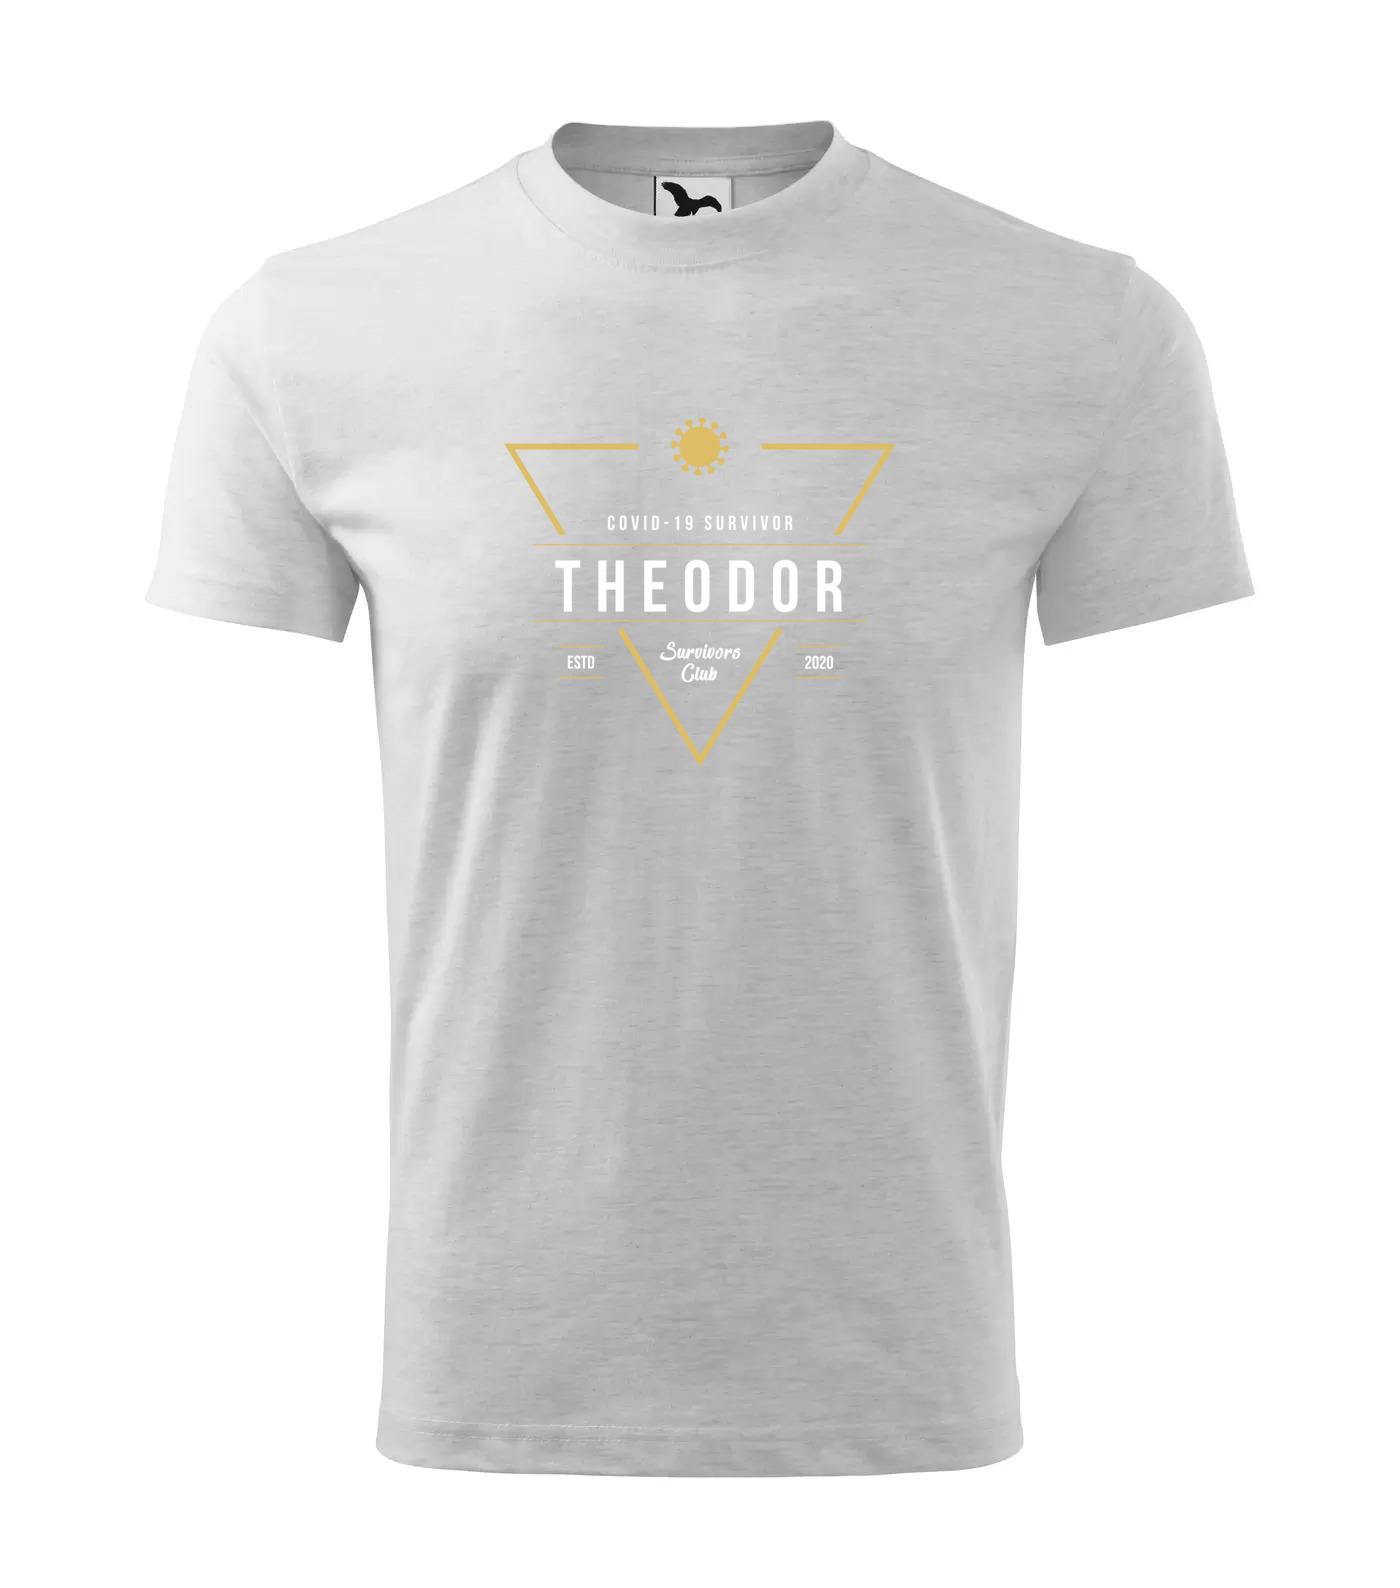 Tričko Survivor Club Theodor